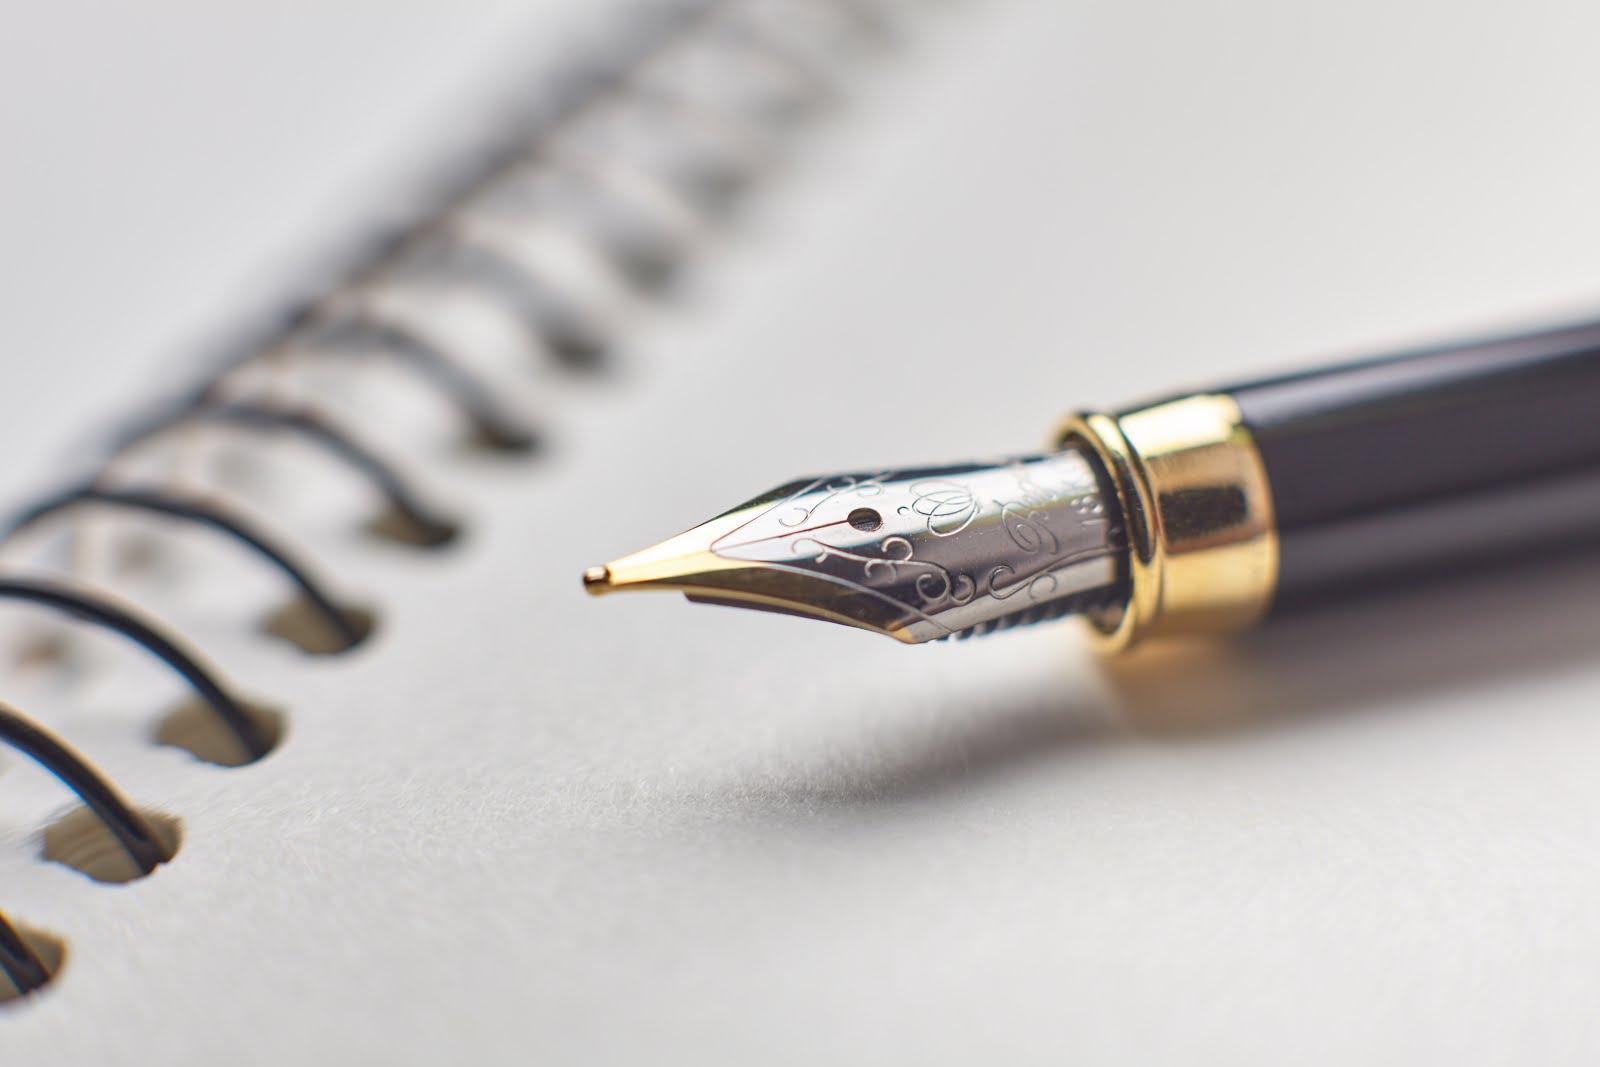 Keine Ahnung.: 物書きにはボールペンよりは万年筆がいい